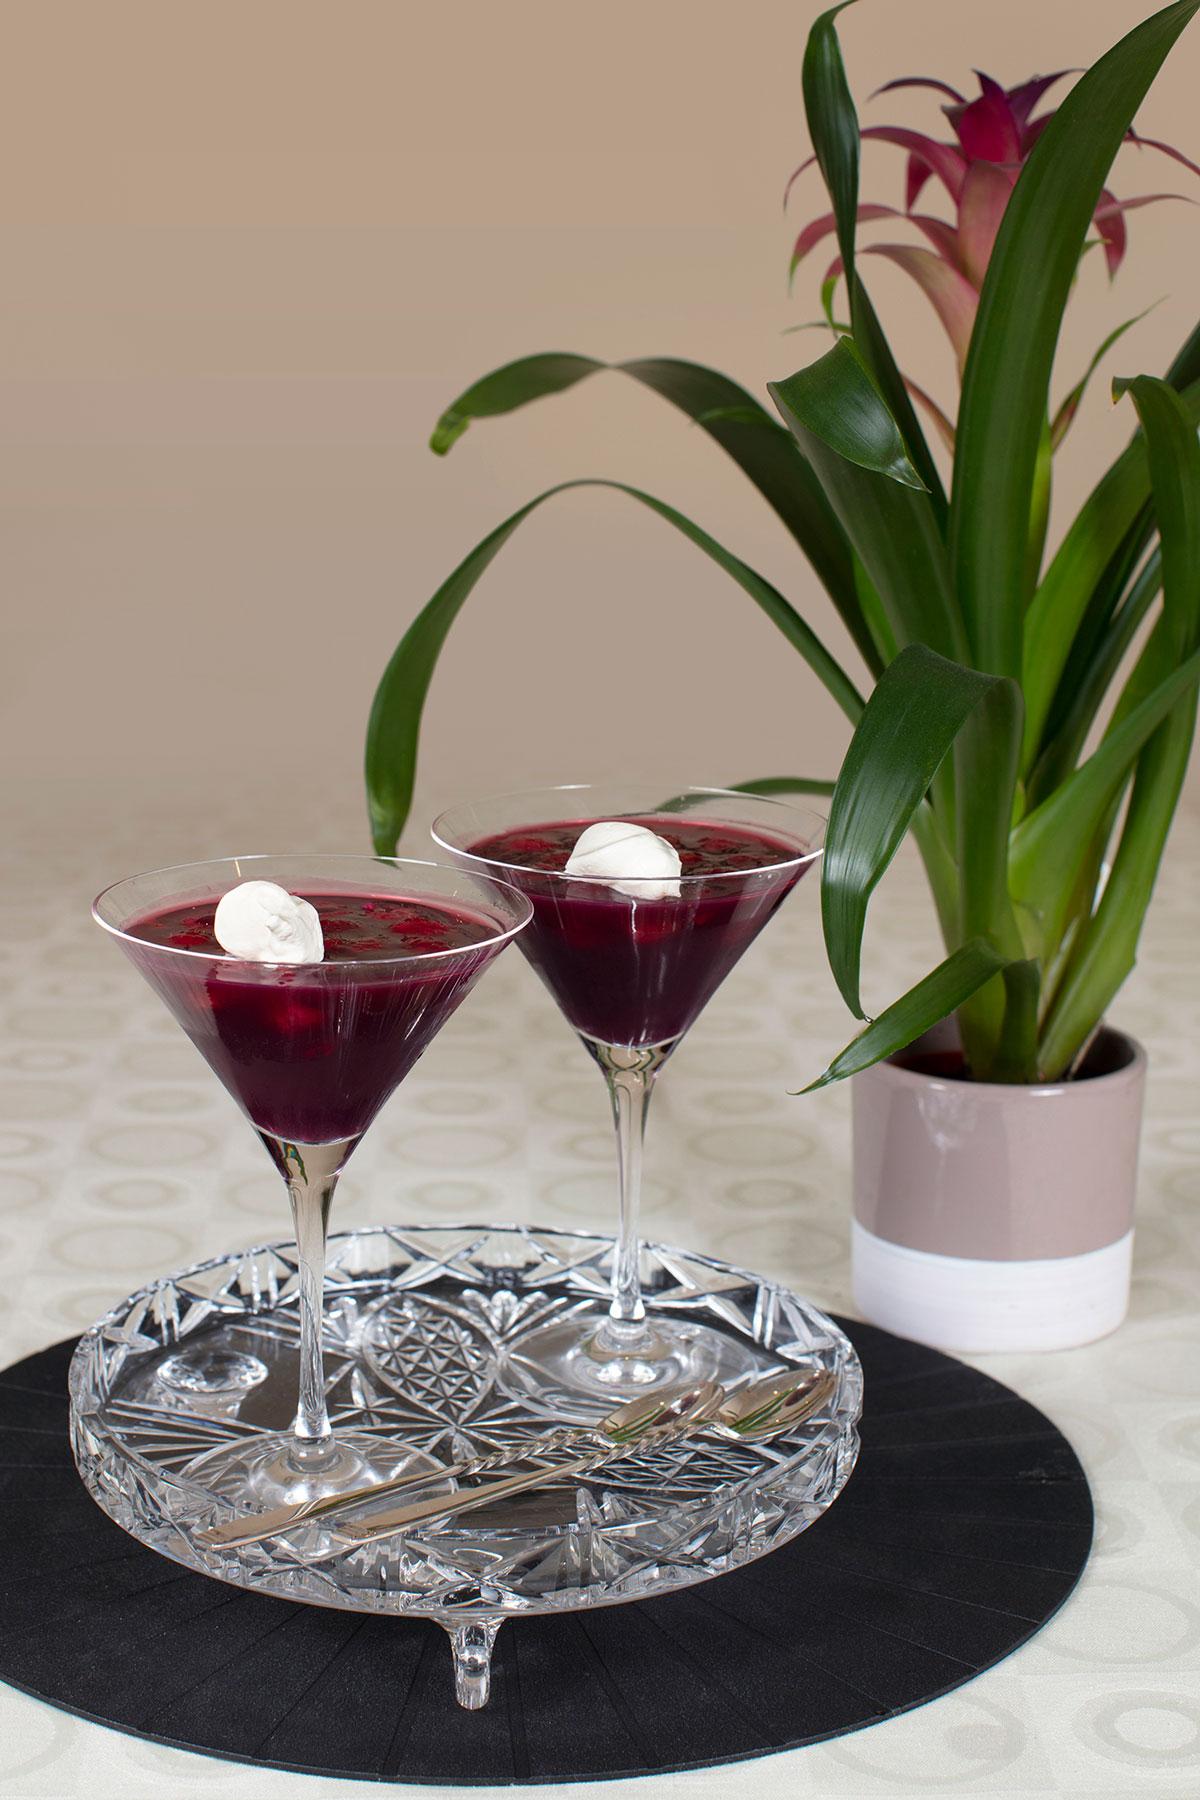 Raspberries-In-Red-Wine-Jelly